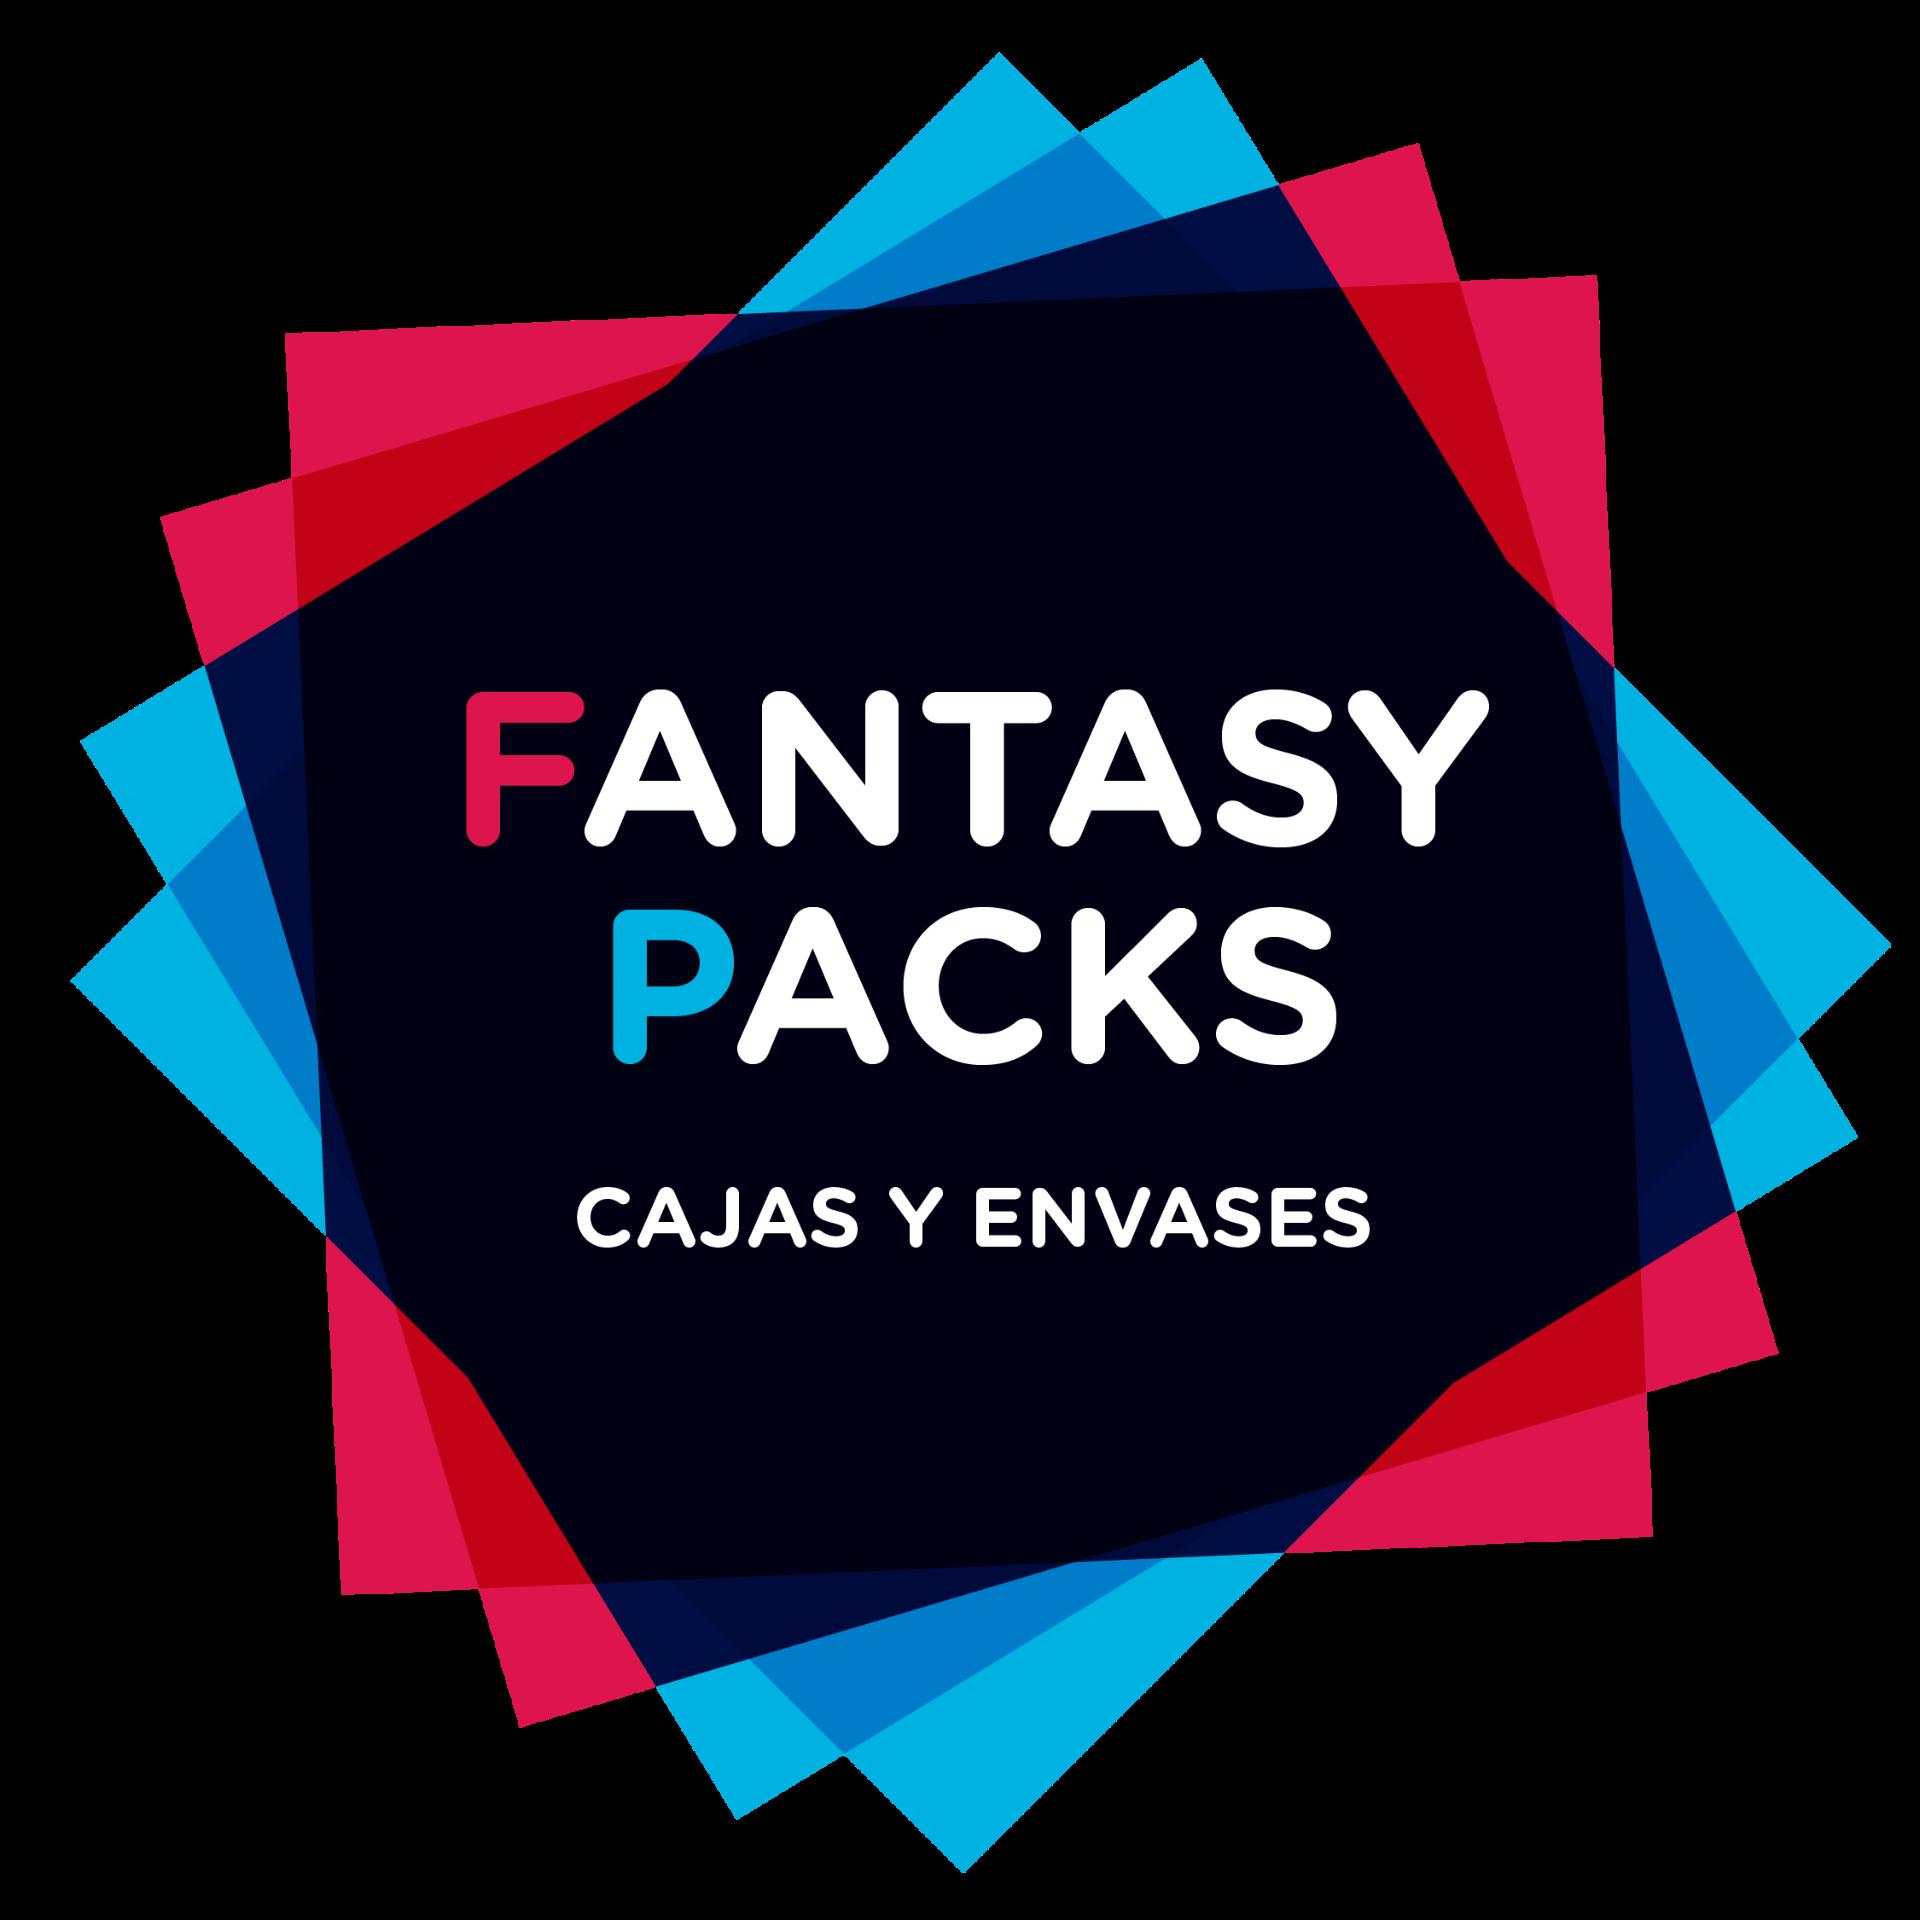 FANTASY-PACKS